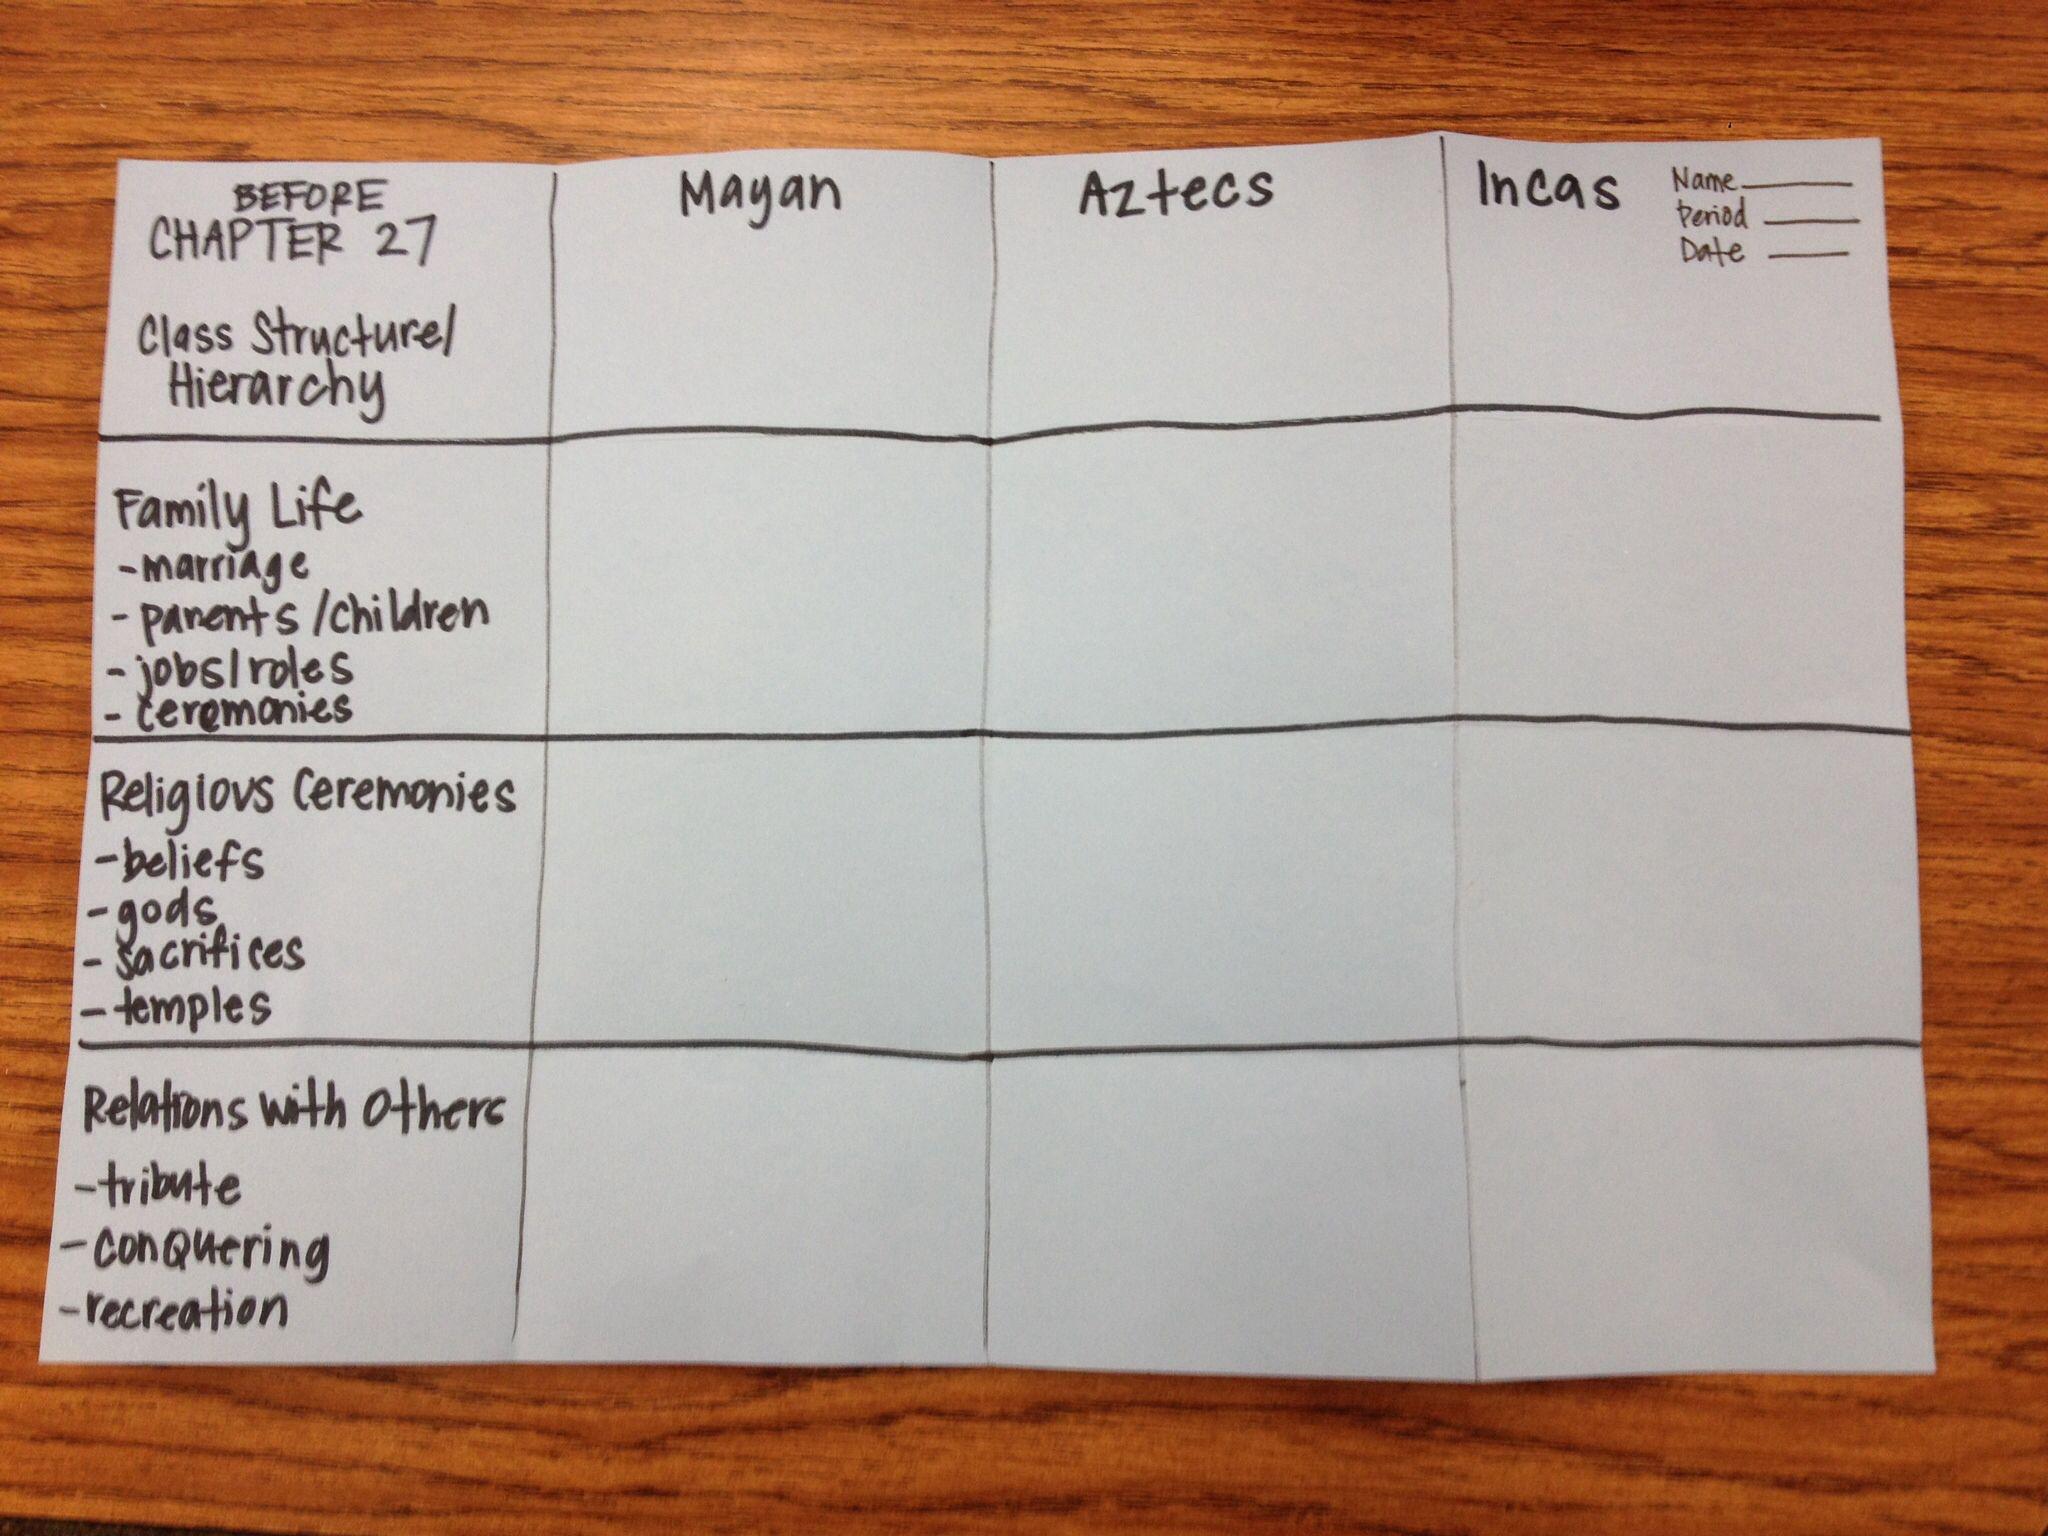 Comparing Aztecs Mayan And Incas Ways 7th Grade History